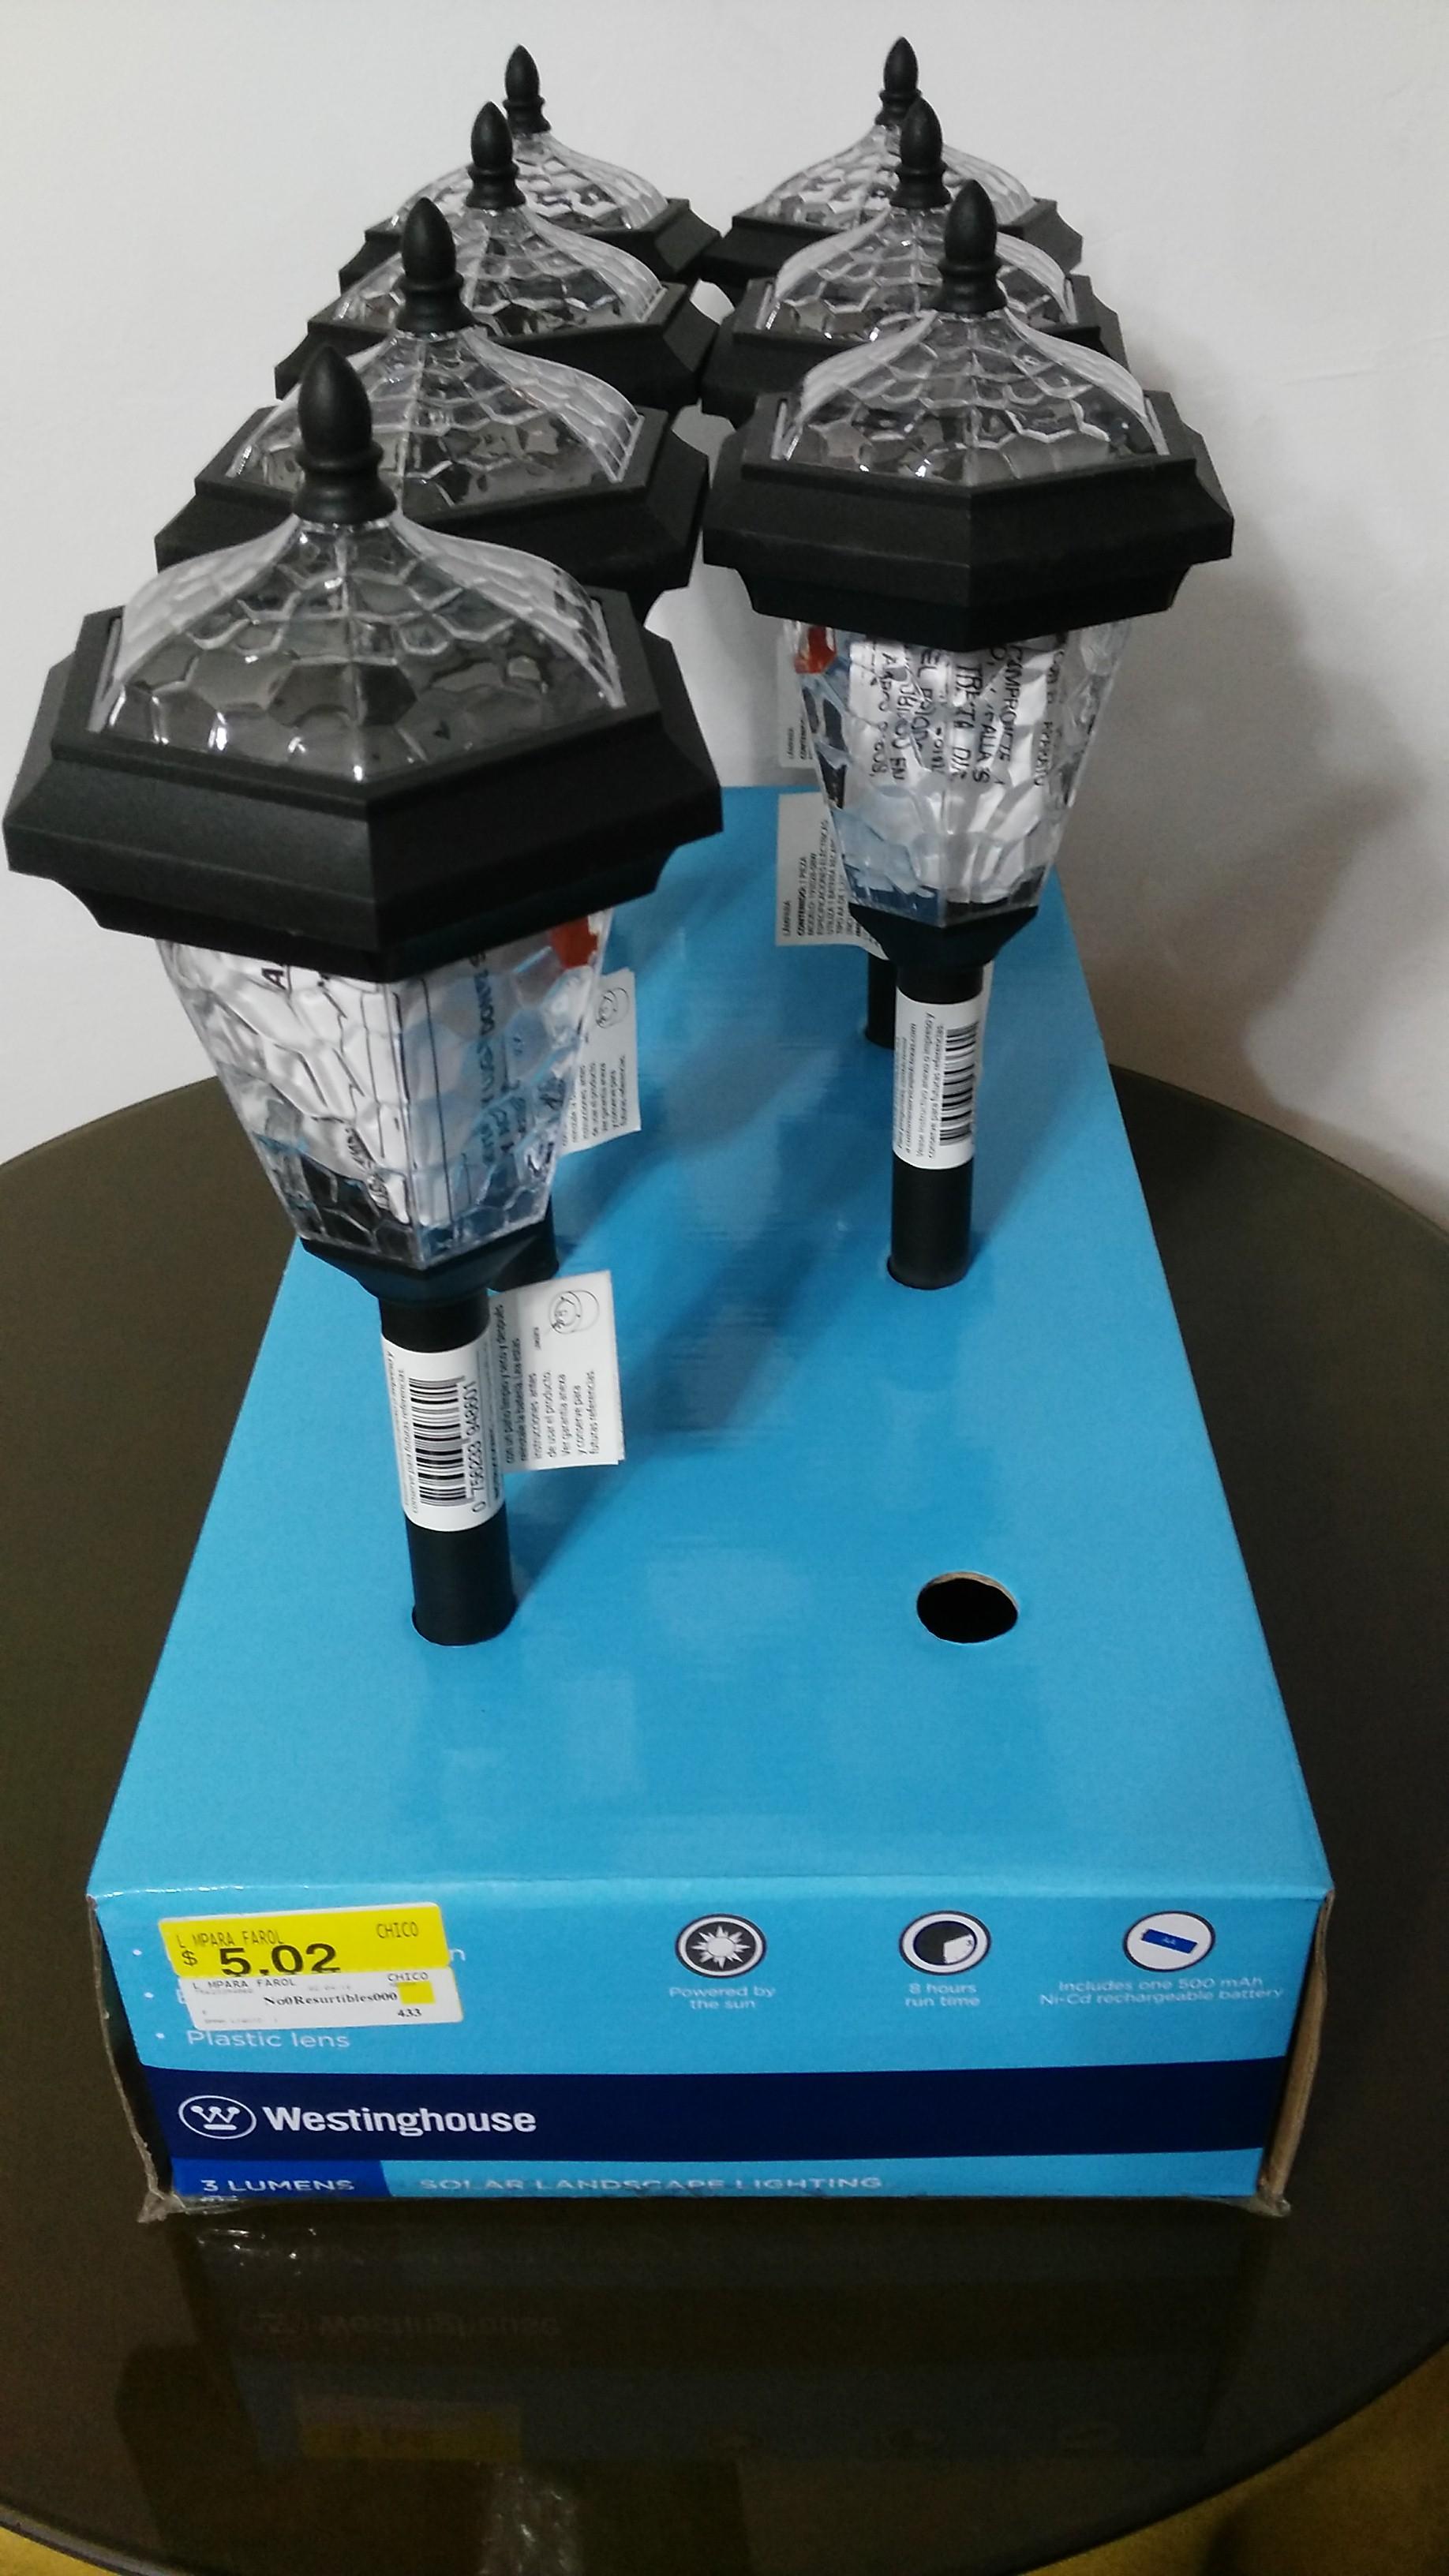 Walmart Arboledas: lámpara farol solar a $5.02